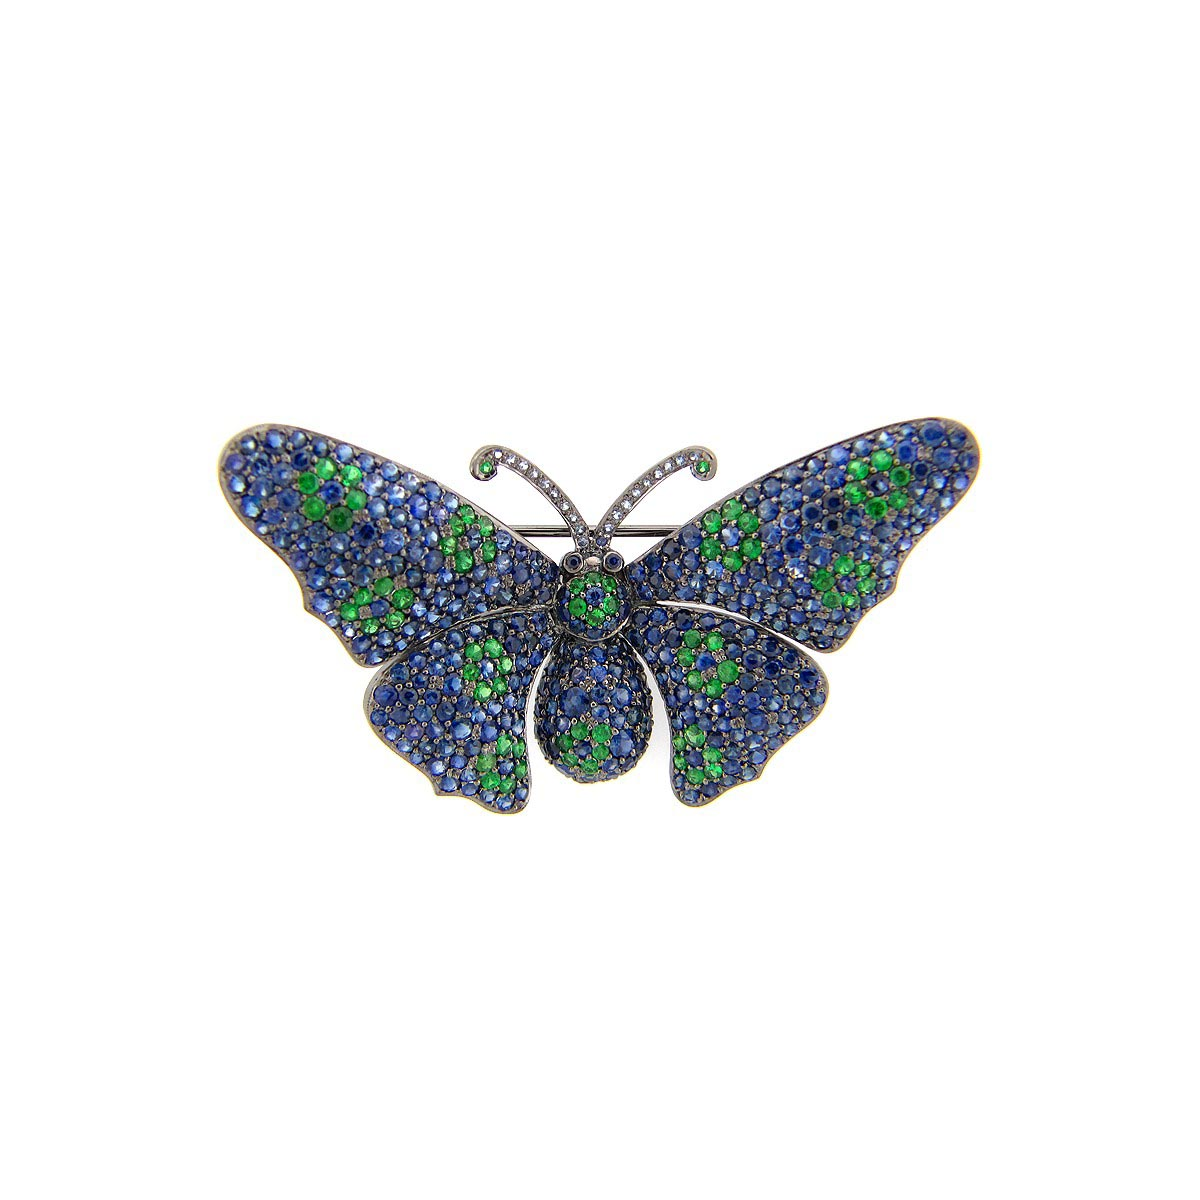 Sapphire & Tsavorite Broach